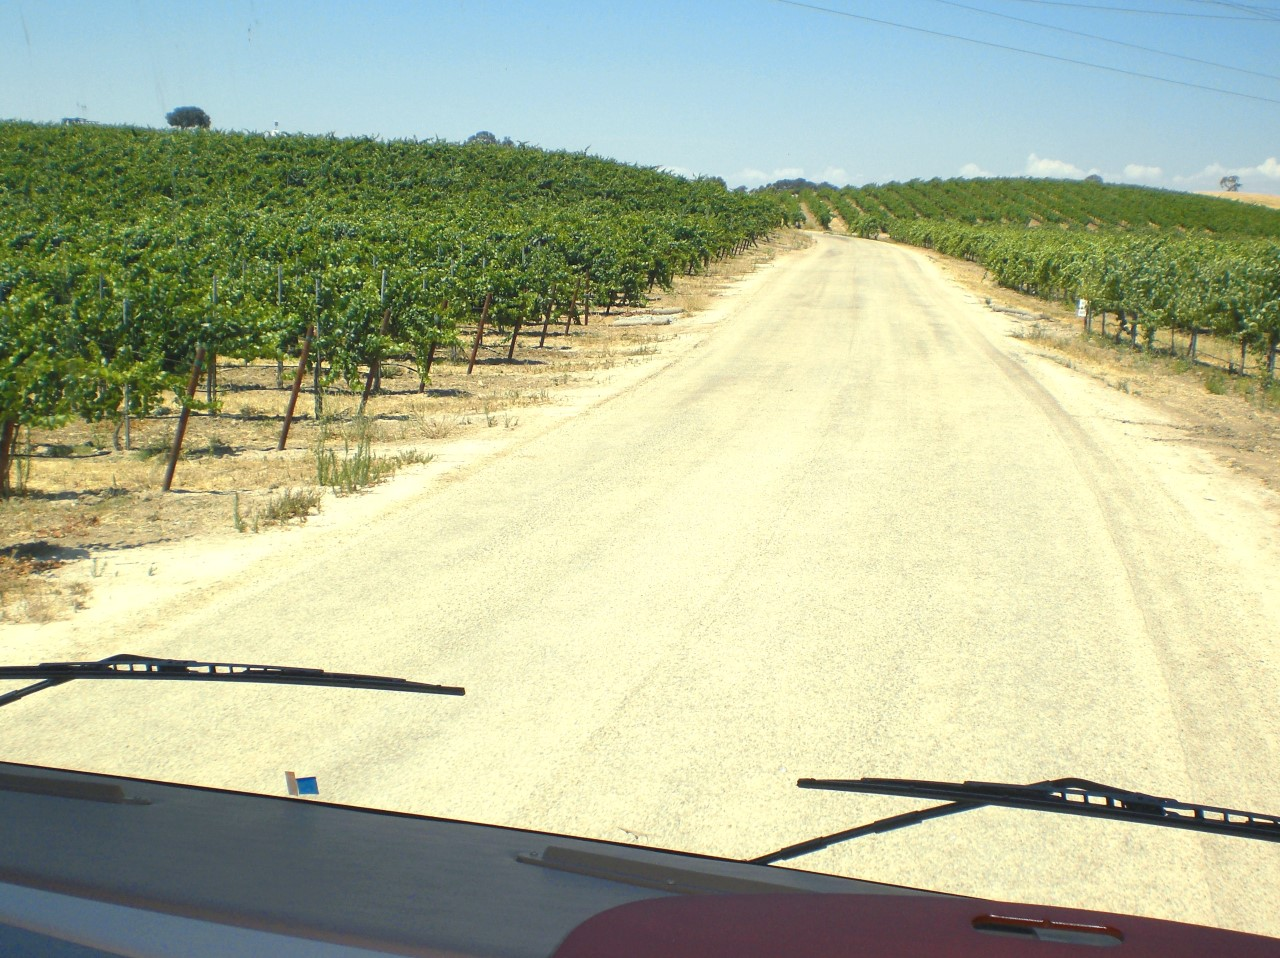 Pear Vally Vineyards driveway